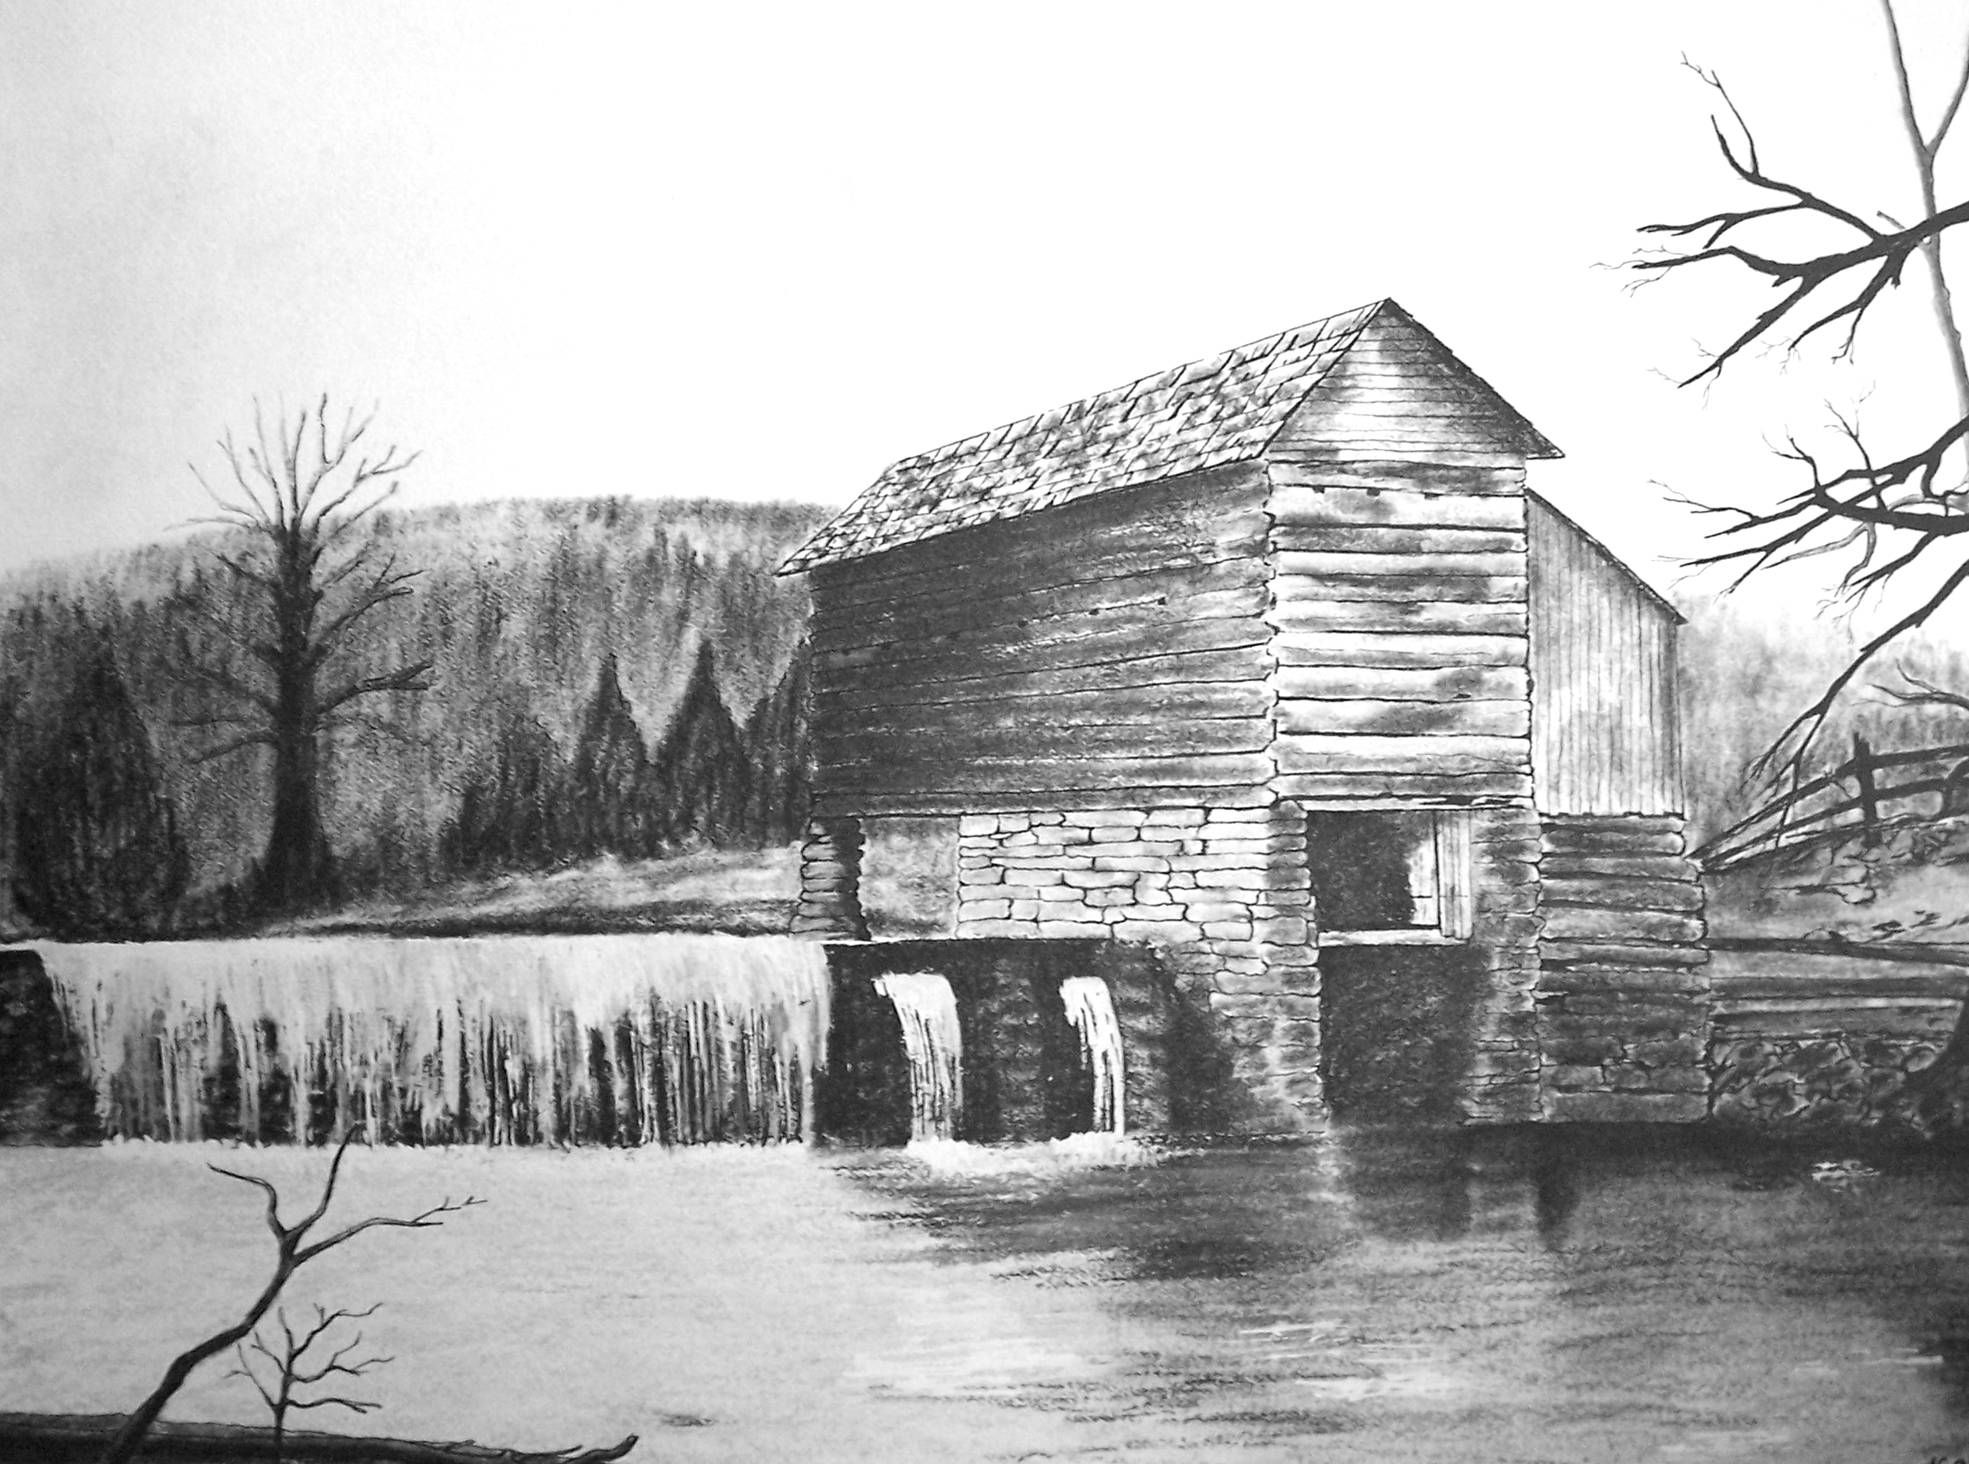 Adkins-Hurt Mill in Wayne County, Kentucky    Places across